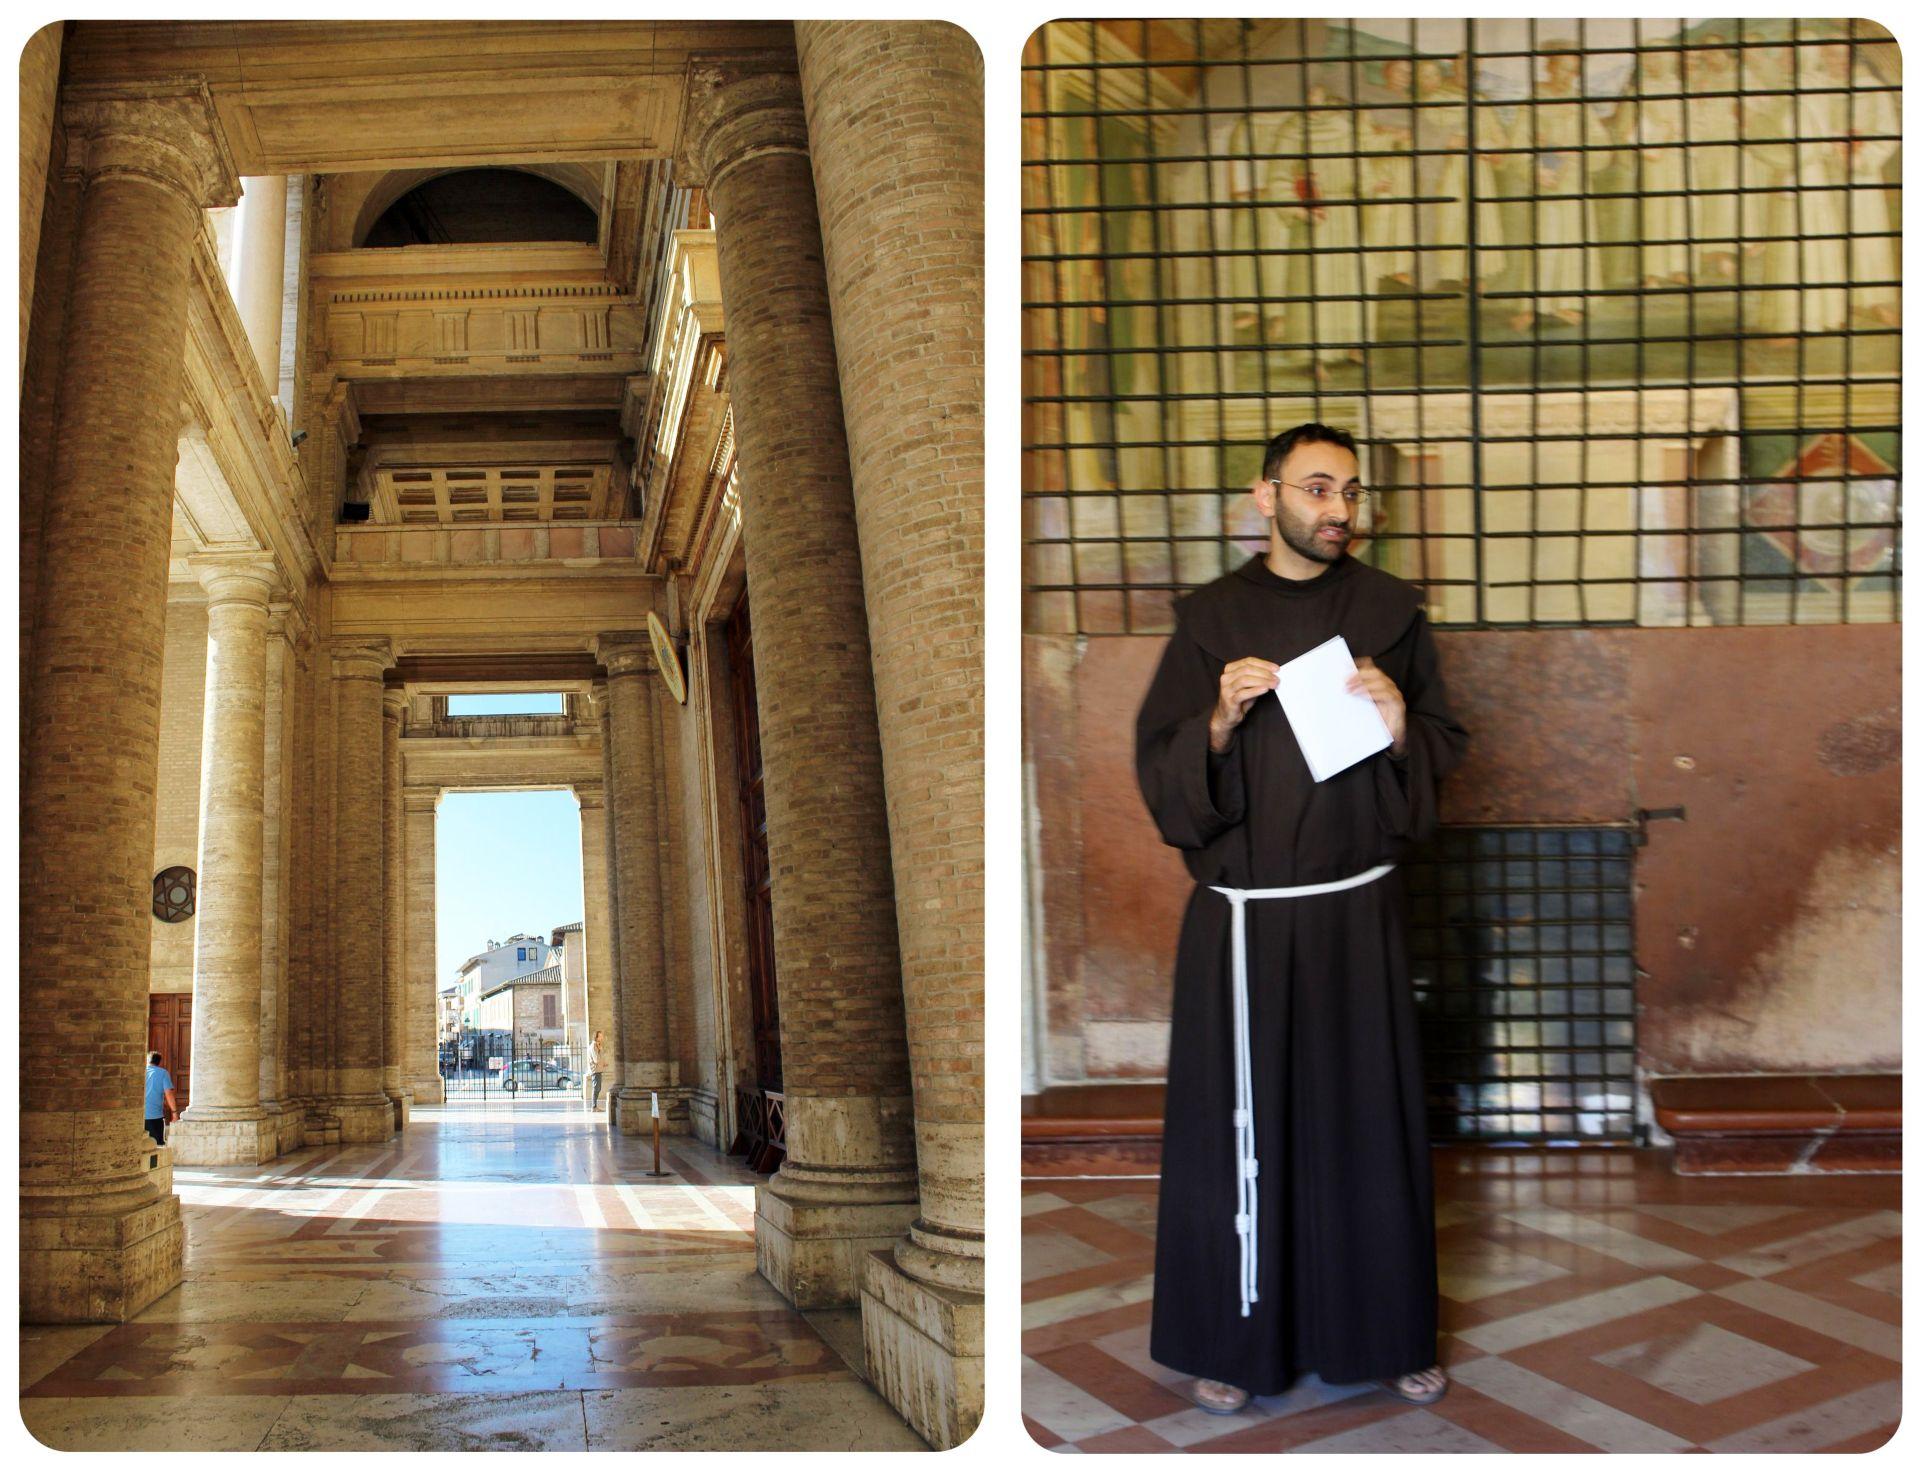 Assisi papal basilica of saint francis